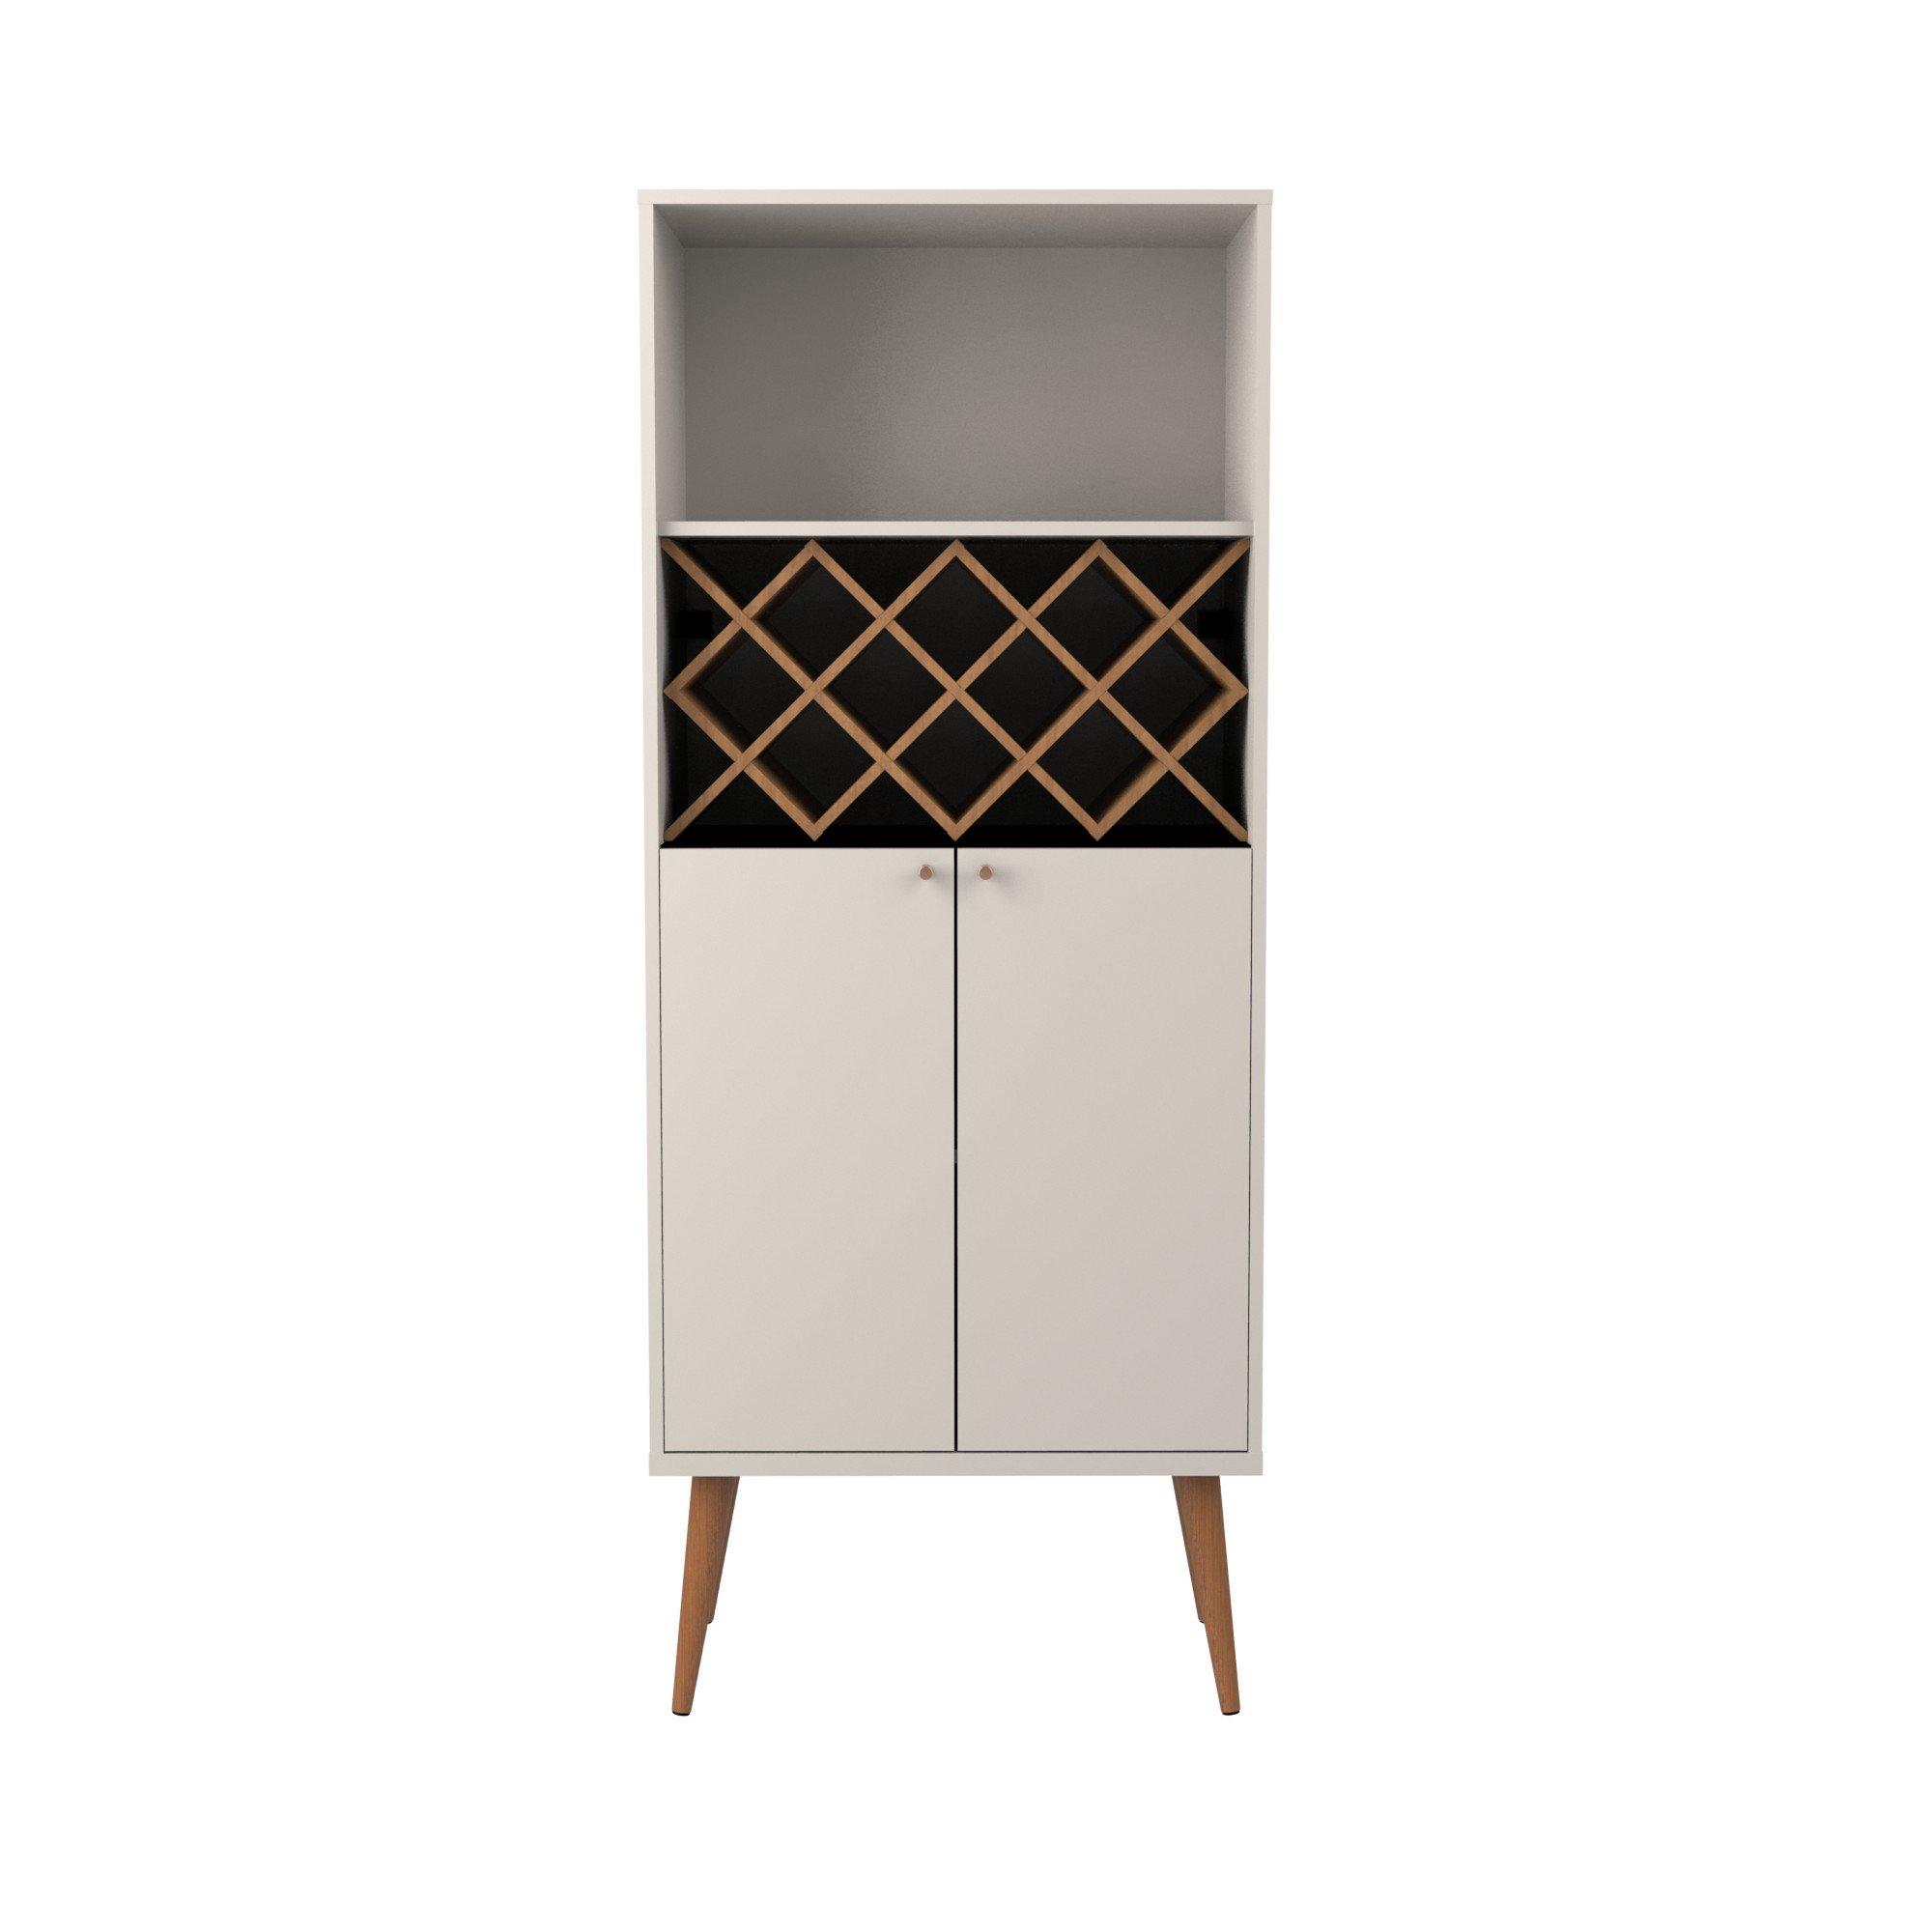 Manhattan Comfort Utopia Collection Mid Century Modern Wine Holder With Storage Cabinet and Three Shelves, Splayed Legs, Off White by Manhattan Comfort